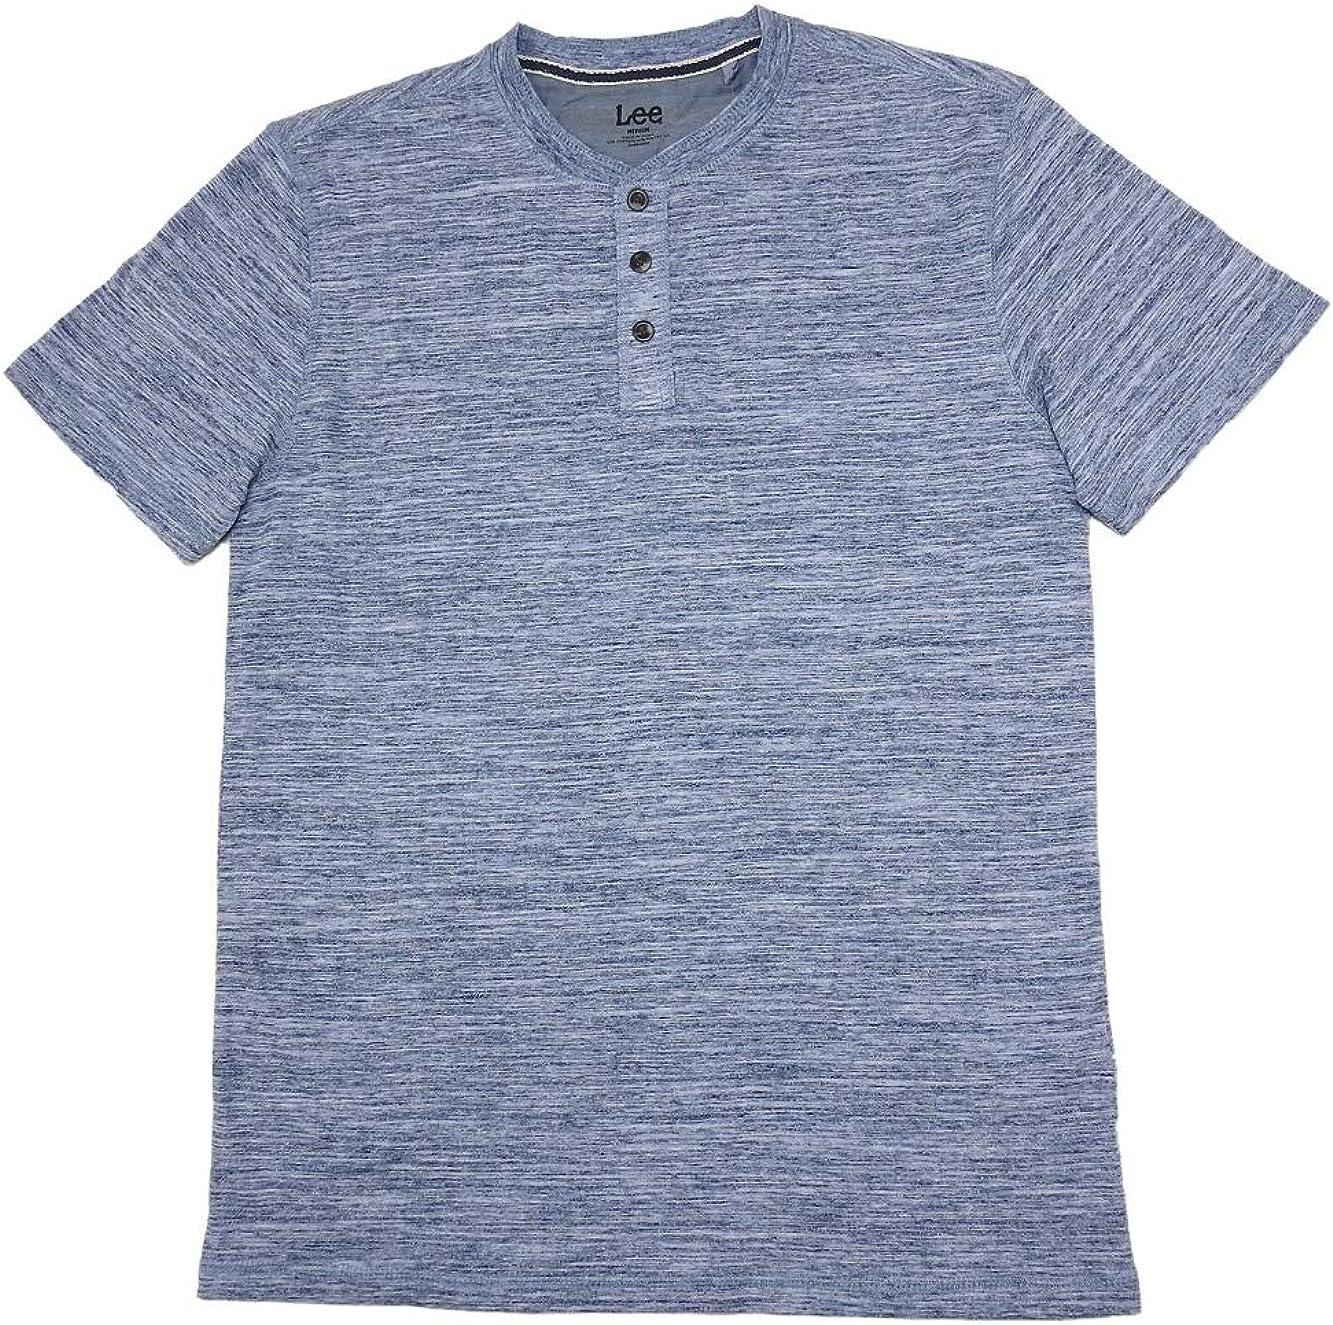 Lee Mens Size Medium Short Sleeve Henley Shirt, Light Blue